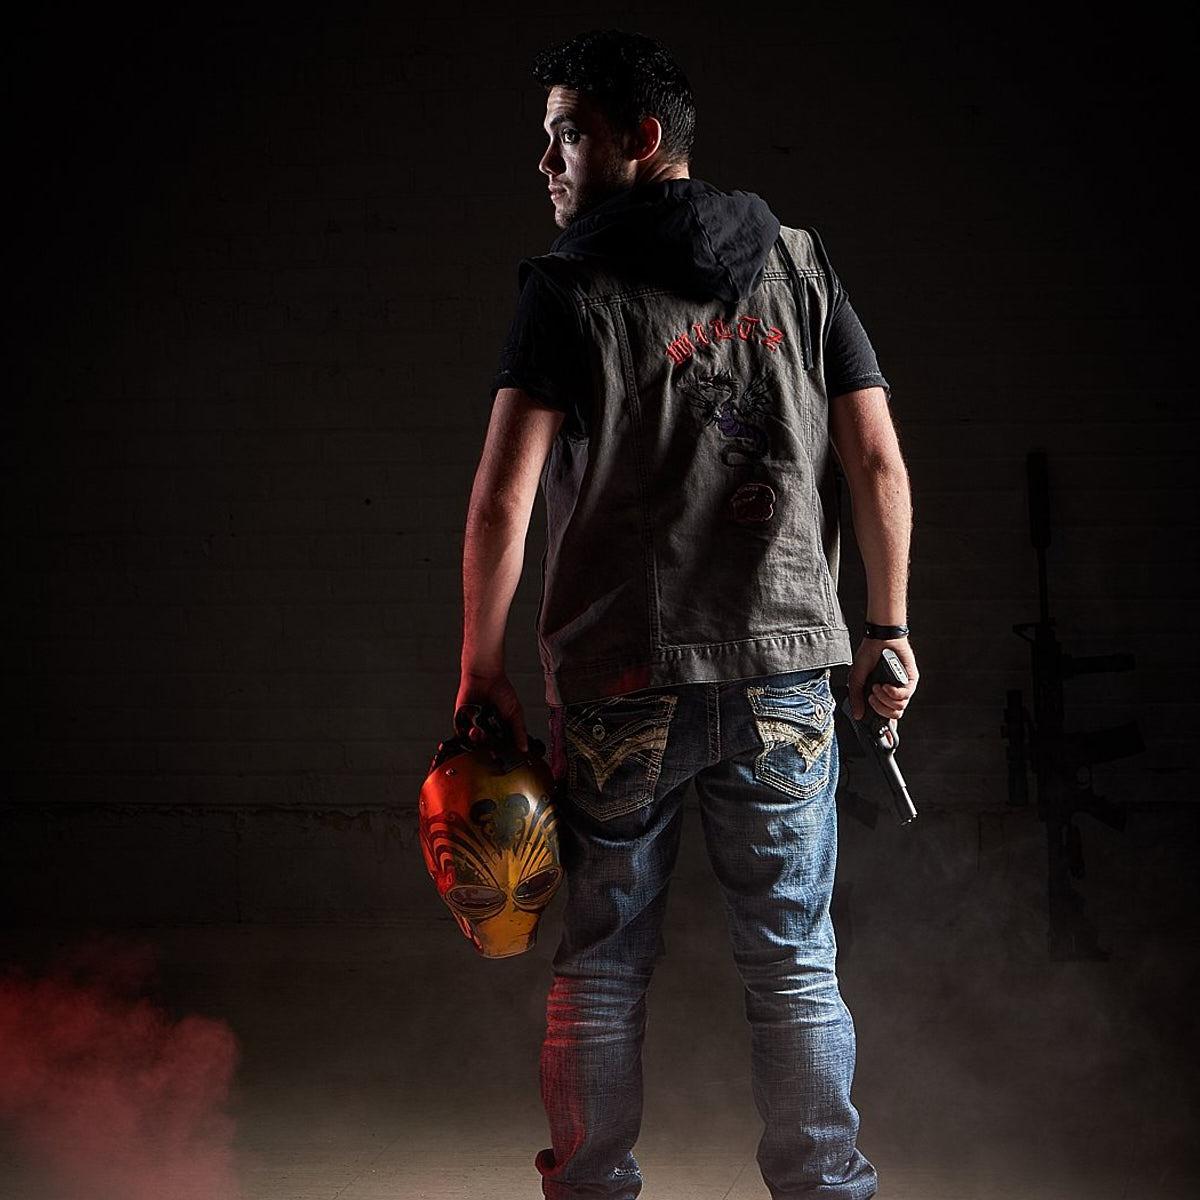 Paramilitary masked gunman